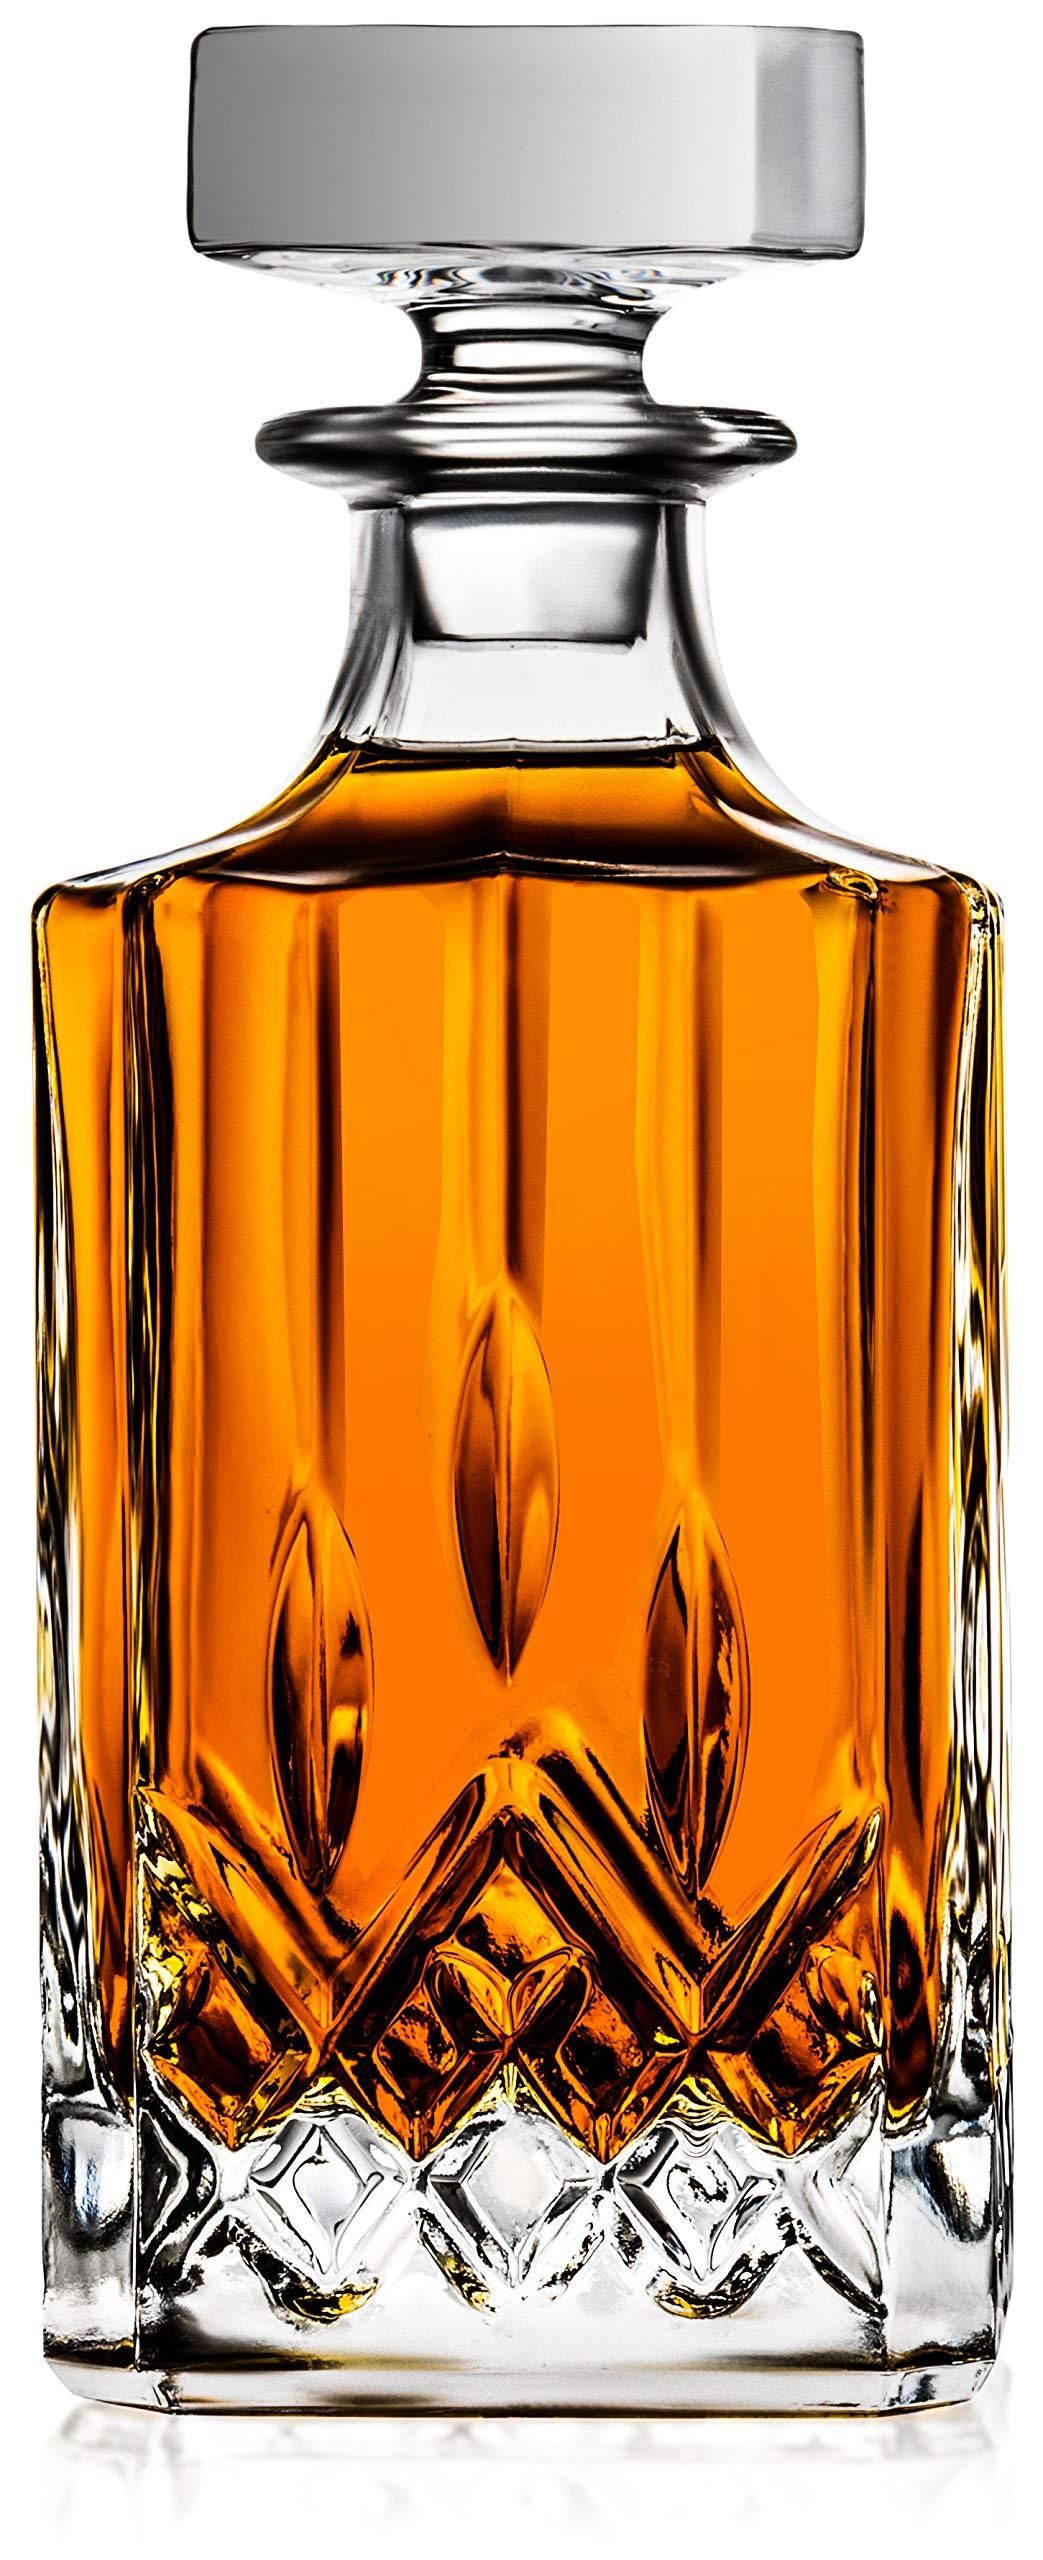 Crystal Decanter Liquor Whiskey Scotch